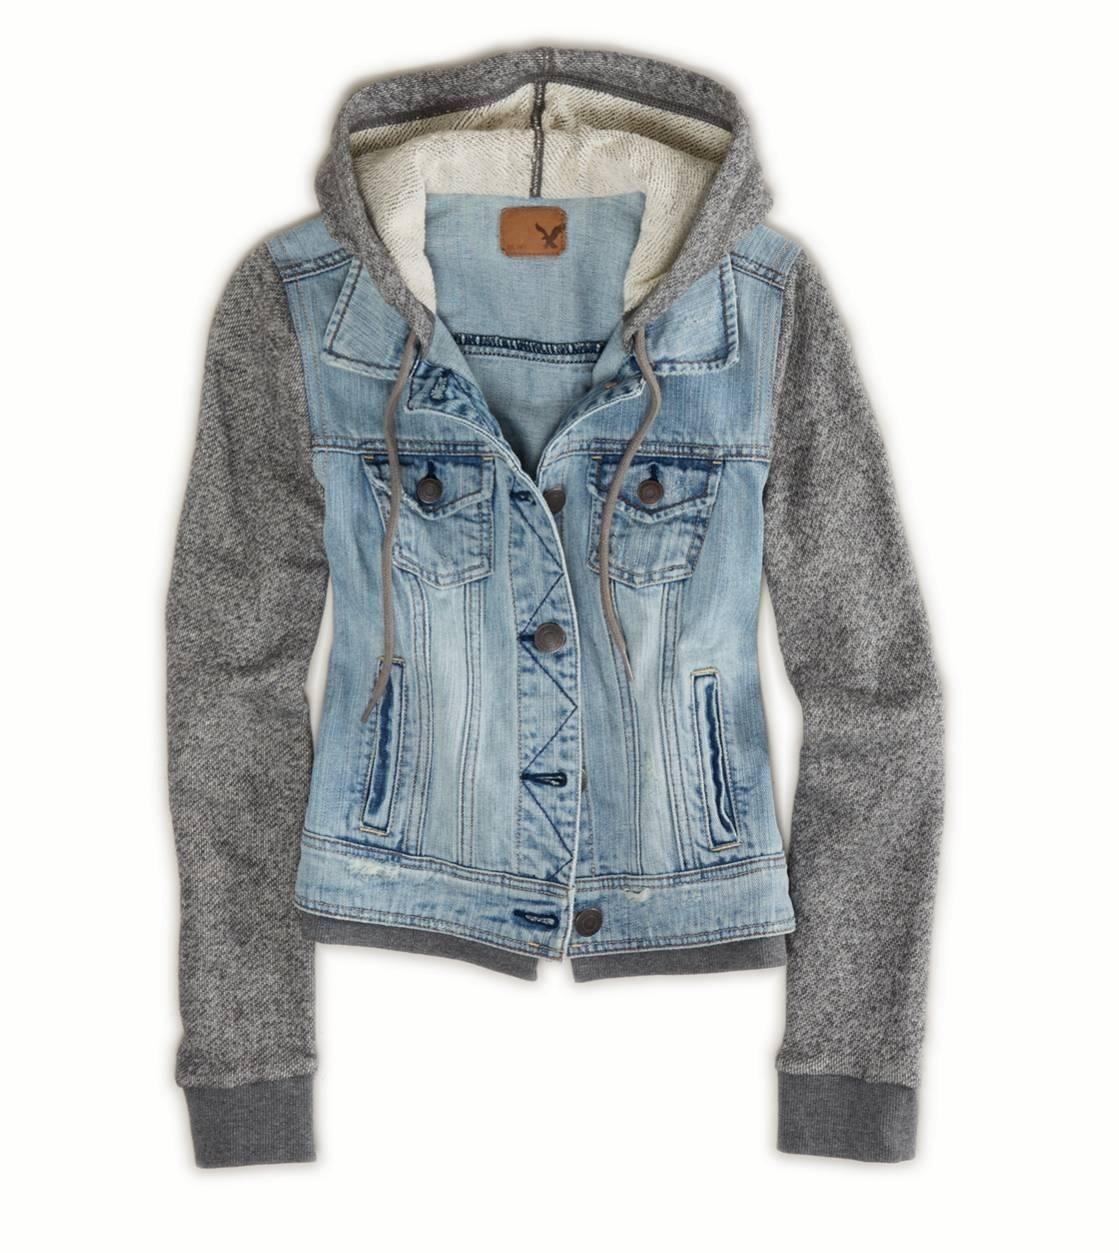 Pin By Gwenyth Homeyer On Cloths Denim Hoodie Fashion Hoodie Vest [ 1253 x 1119 Pixel ]